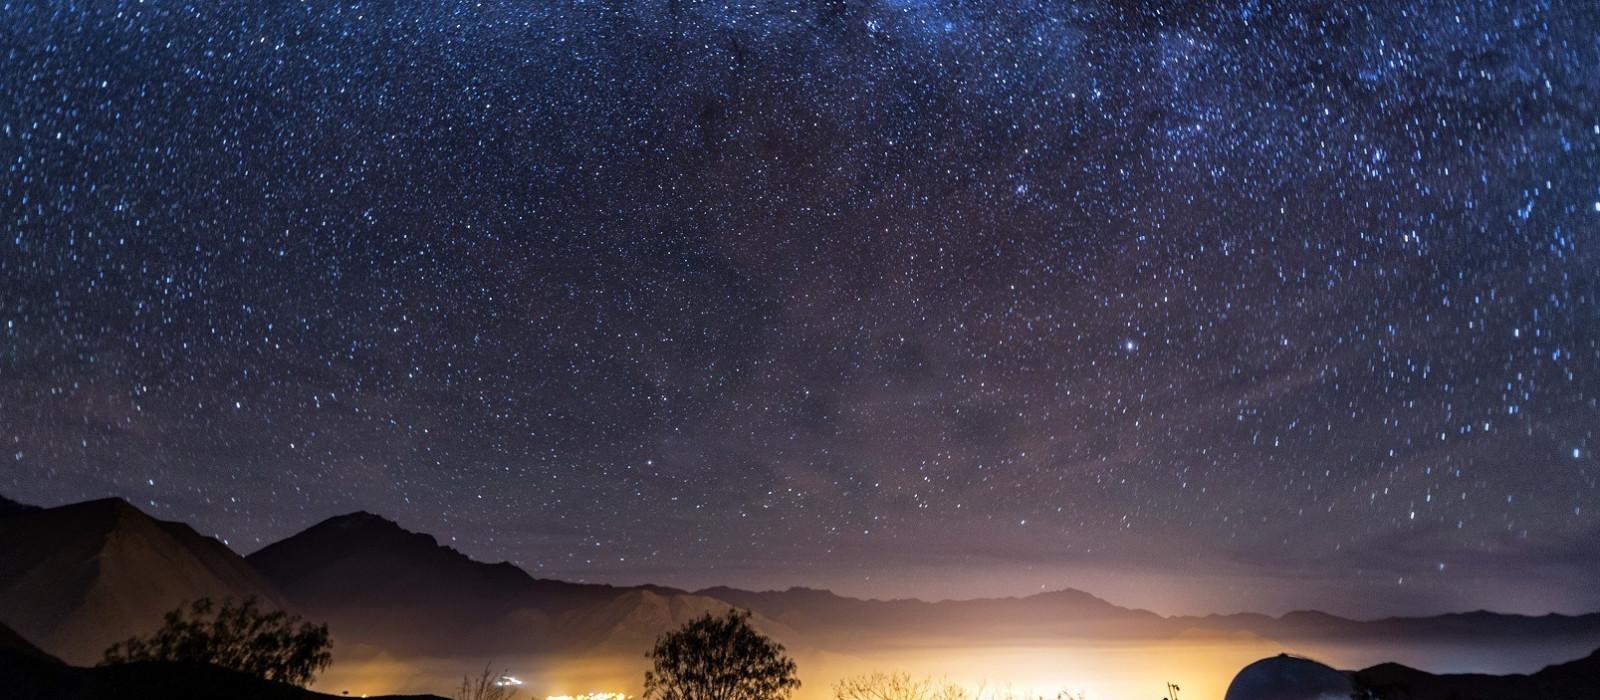 Chile: Awasi Iconic Extremes Tour Trip 1